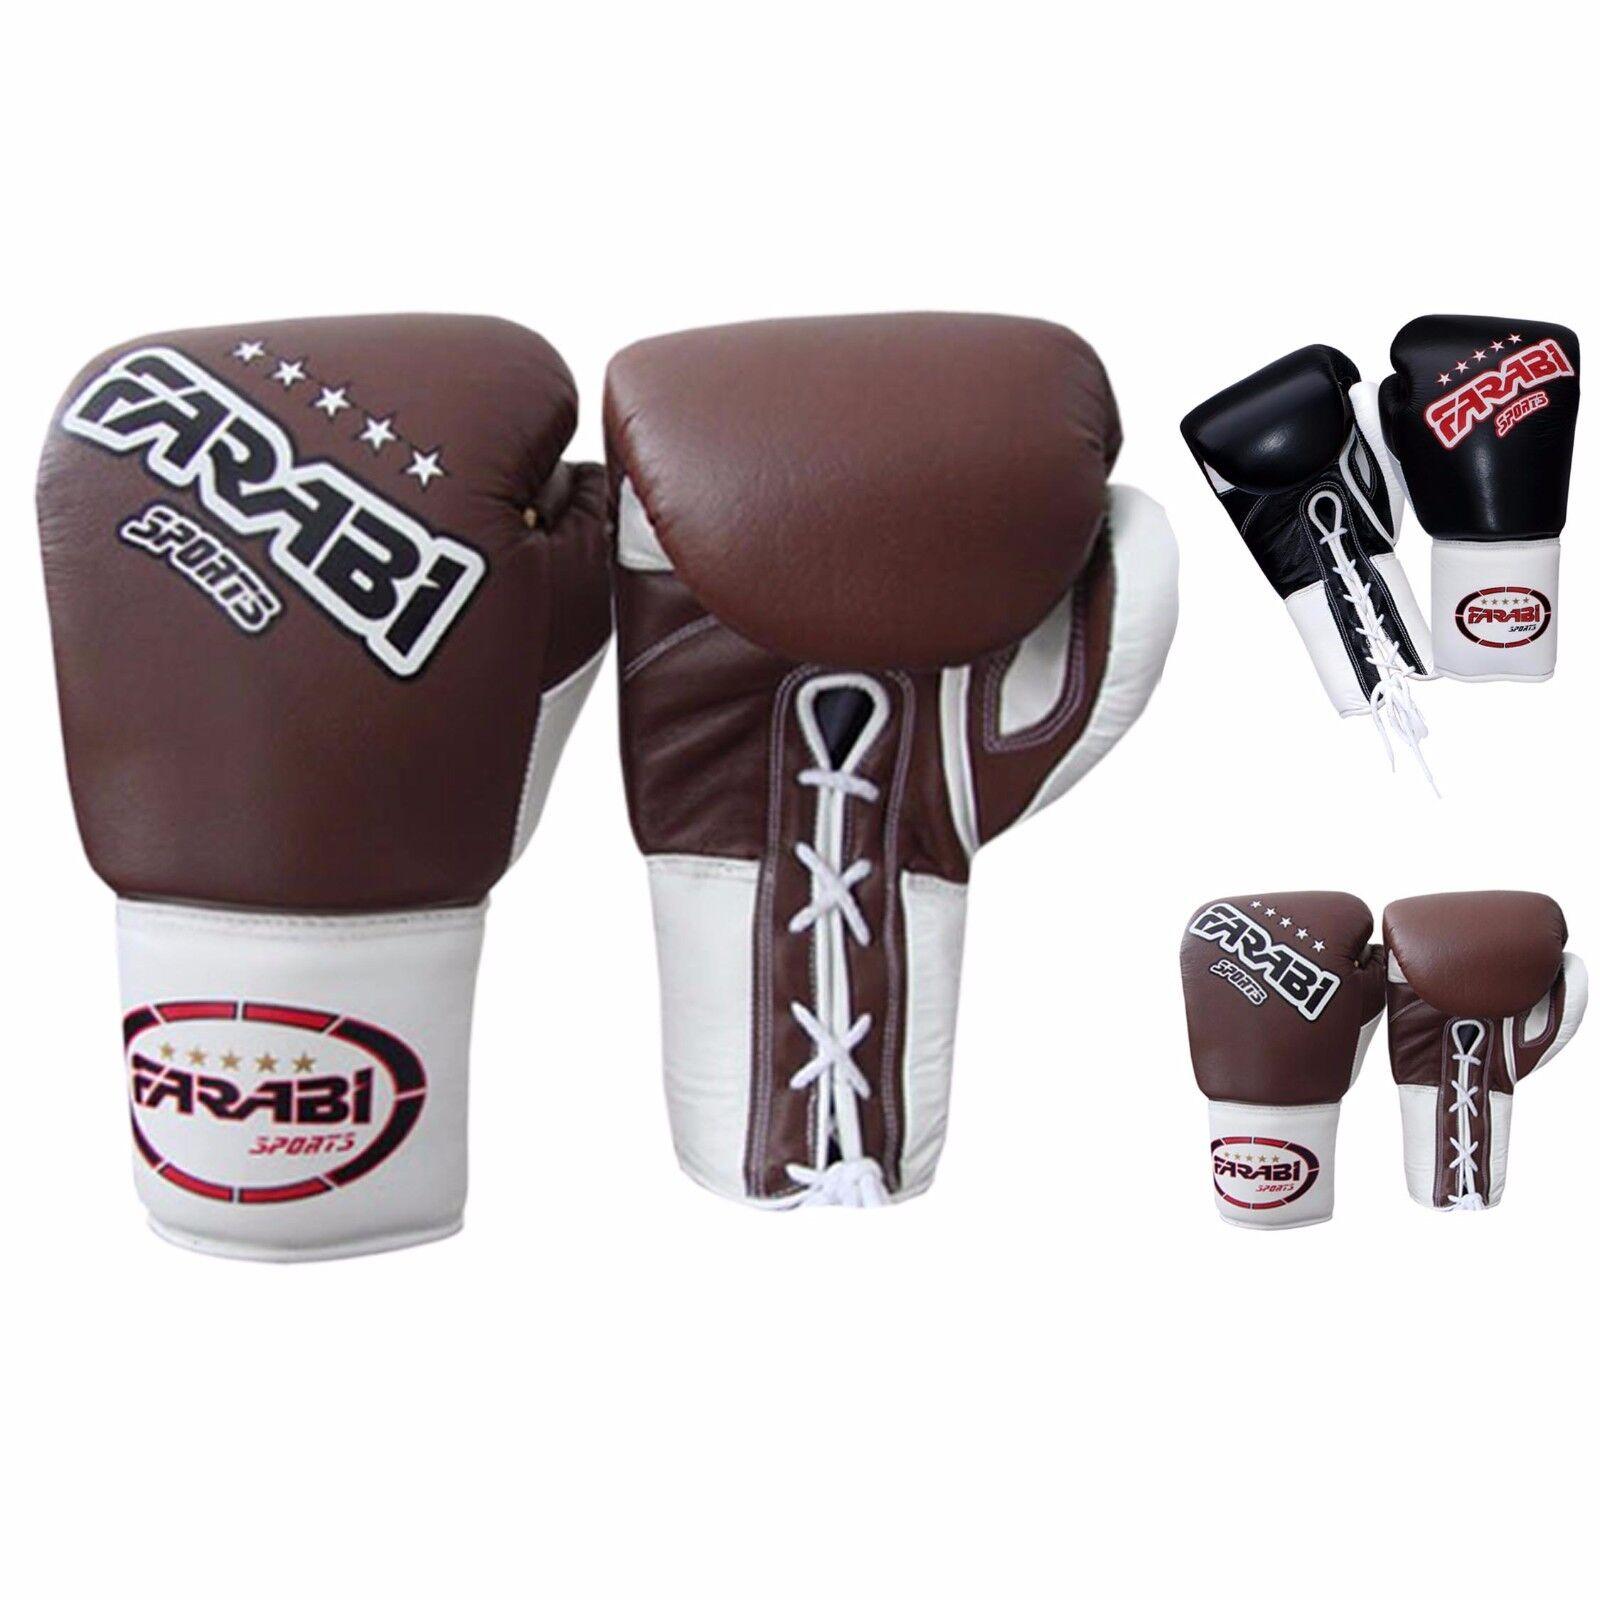 Farabi Laces Genuine Leder Boxing Gloves